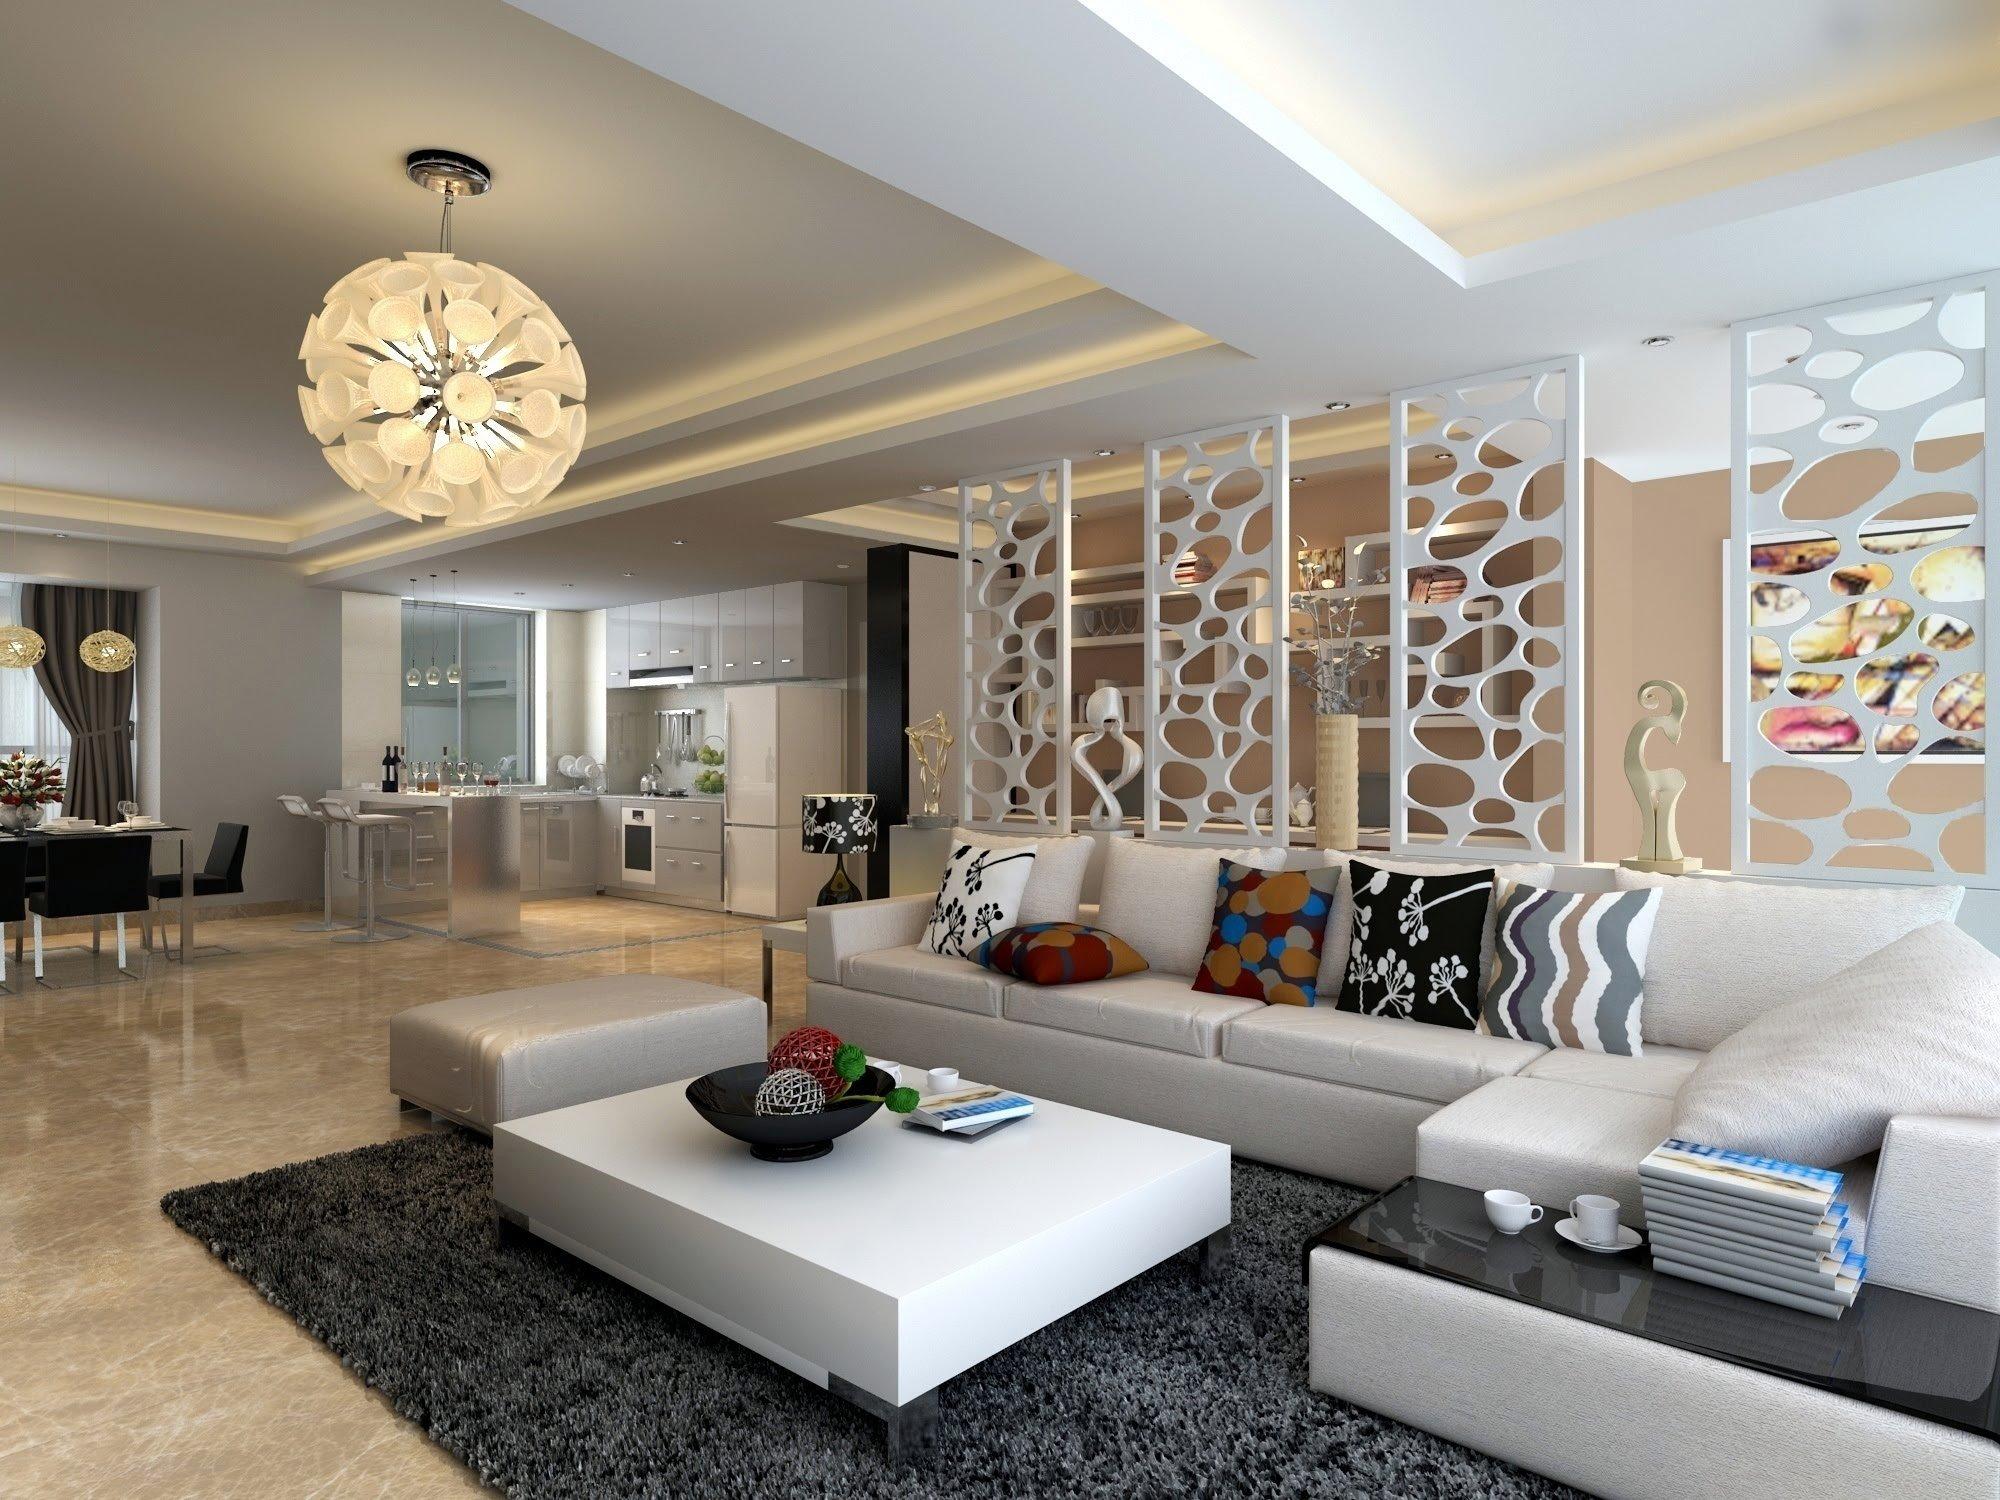 10 Cute Contemporary Living Room Furniture Ideas white living room furniture decorating ideas youtube 1